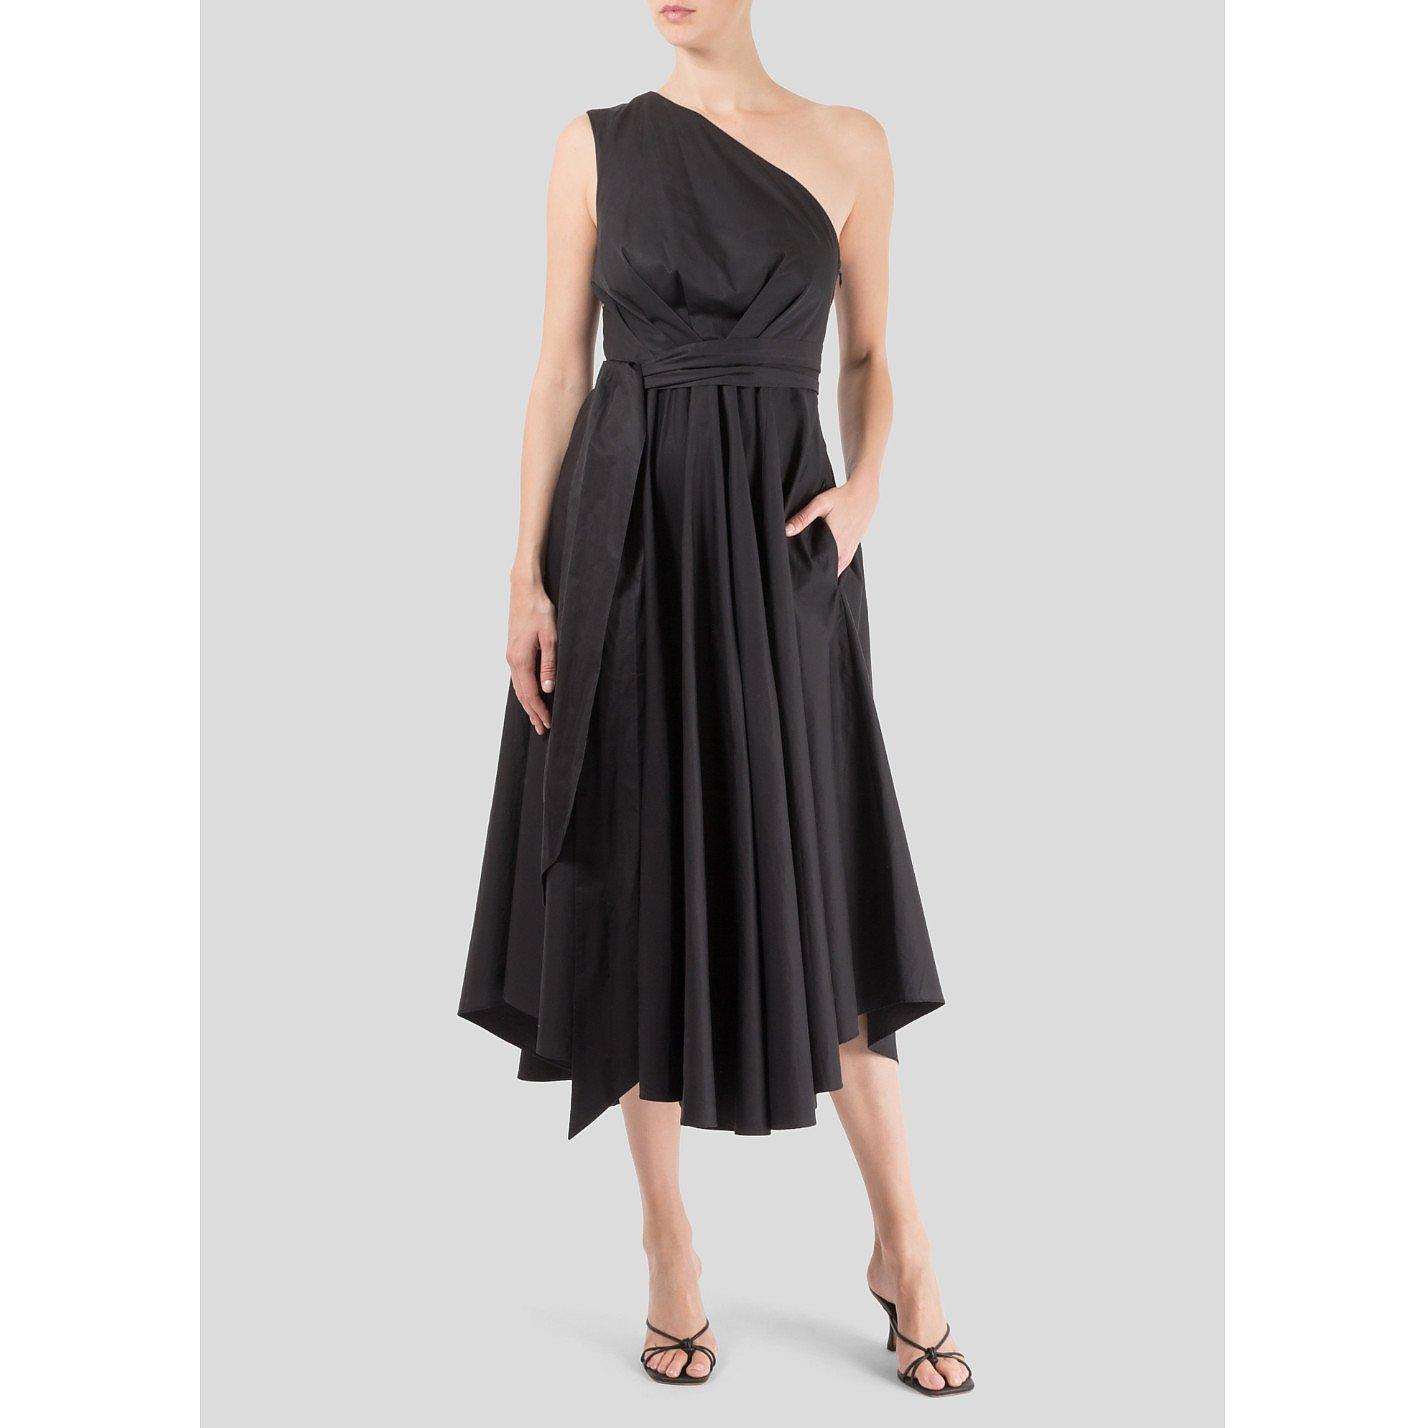 Tibi One Shoulder Midi Dress